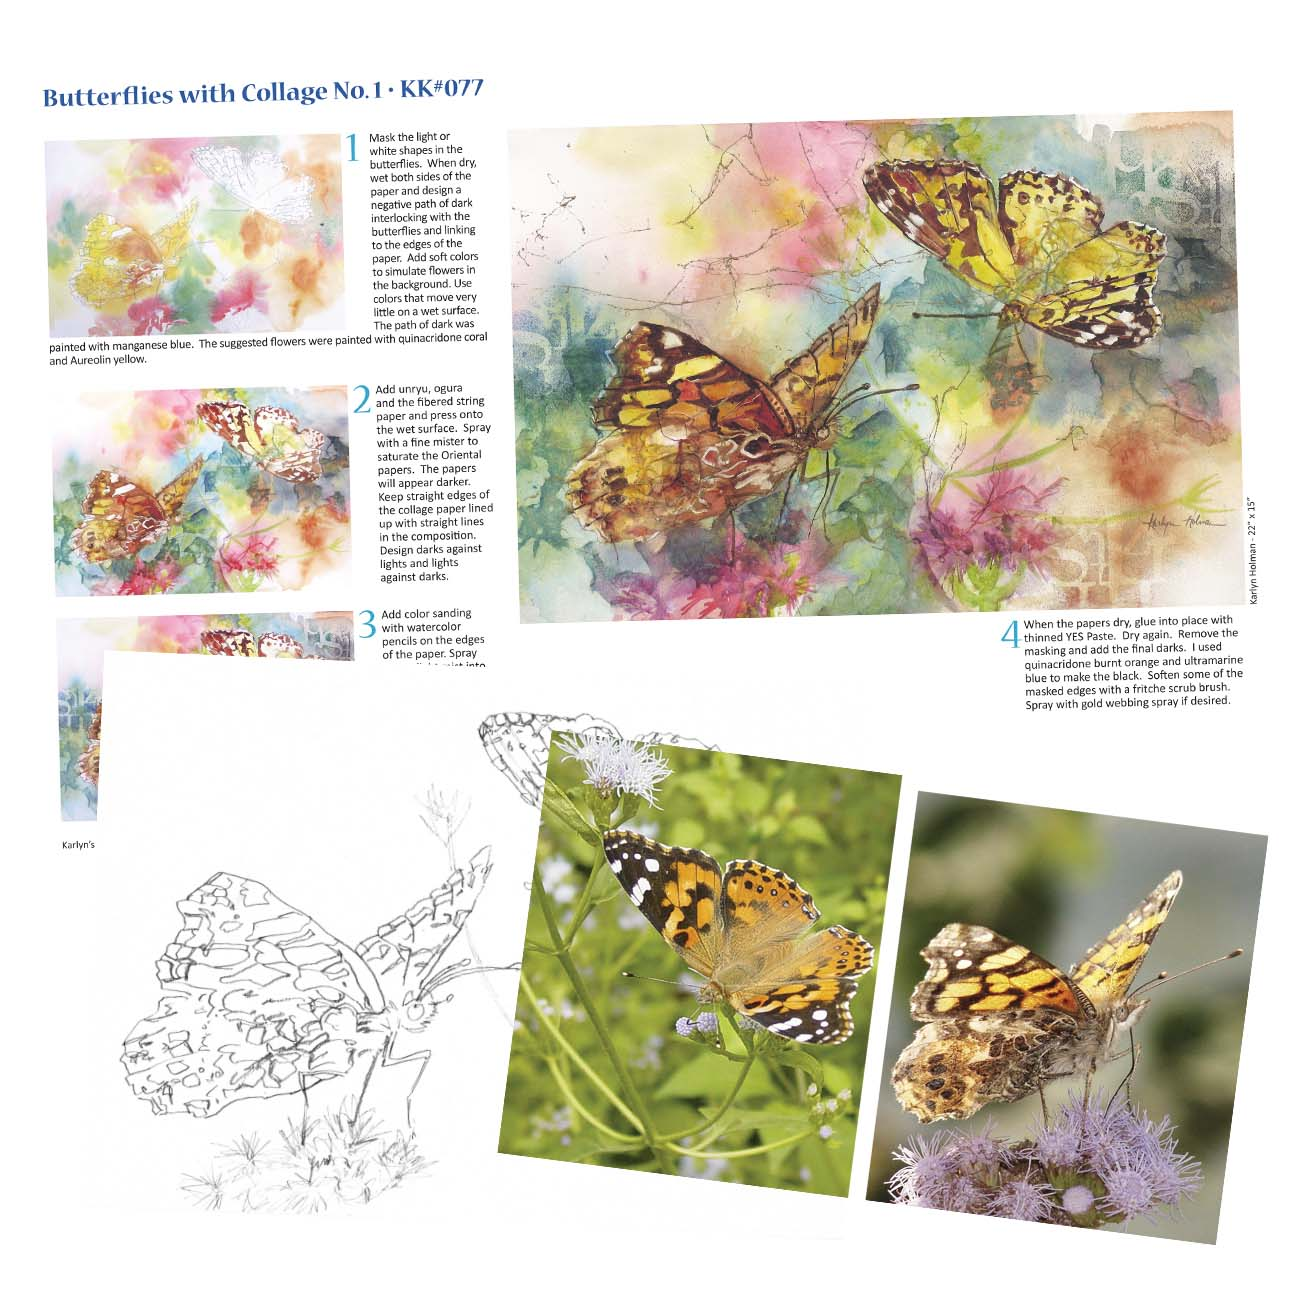 KK077 - Butterflies Collage No. I